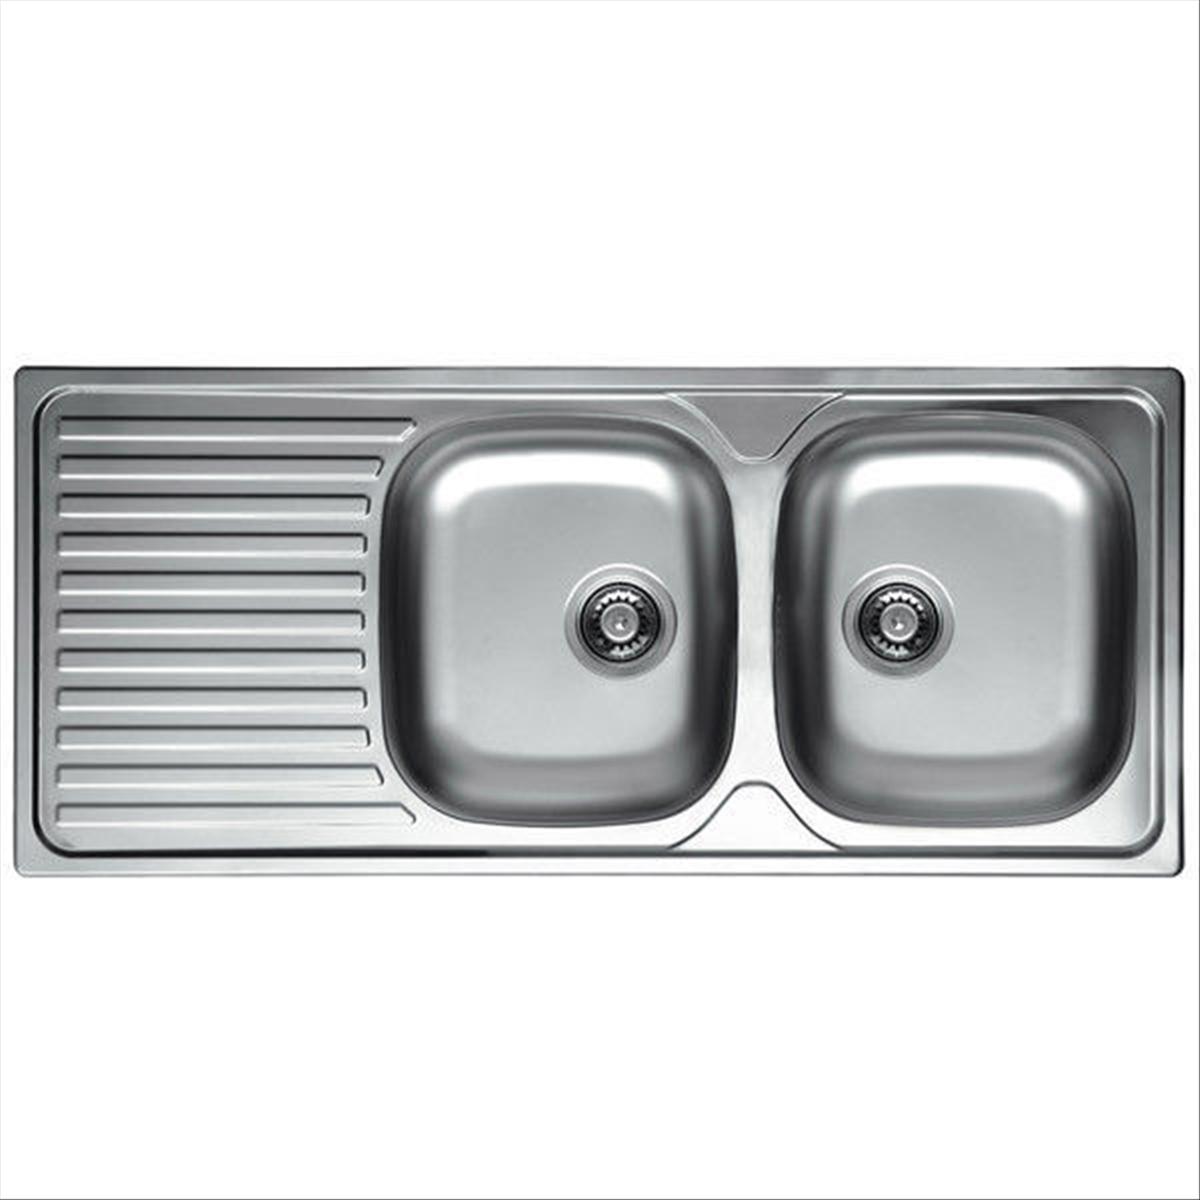 Lavelli Cucina Inox Incasso : Lavello lavandino cucina inox da incasso cm ala